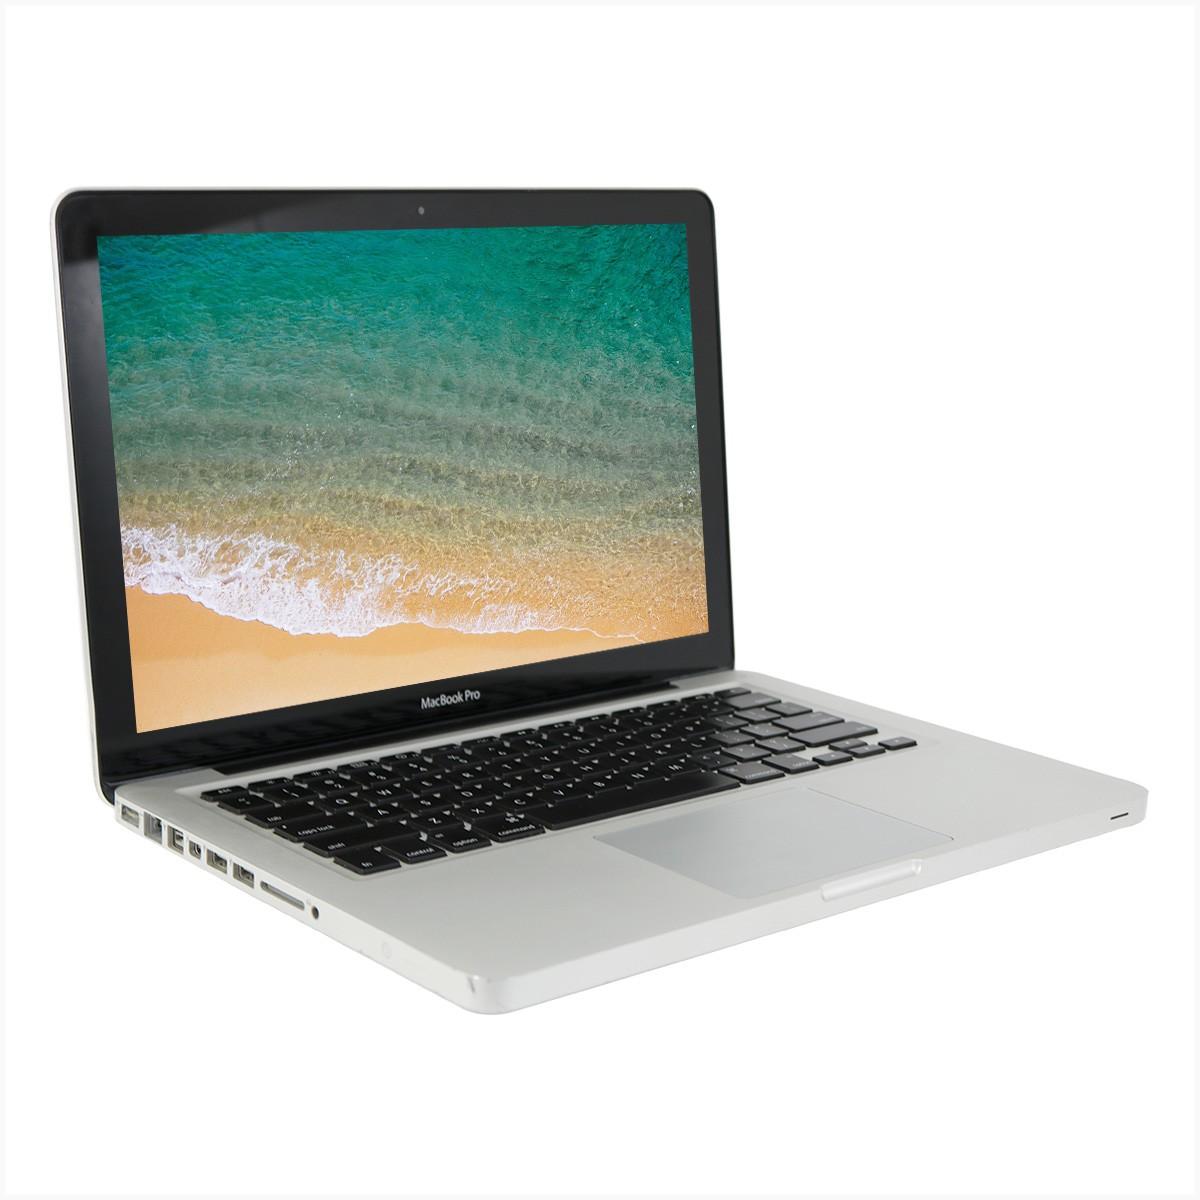 Apple macbook pro 8,1 i5 4gb 240 gb ssd - usado